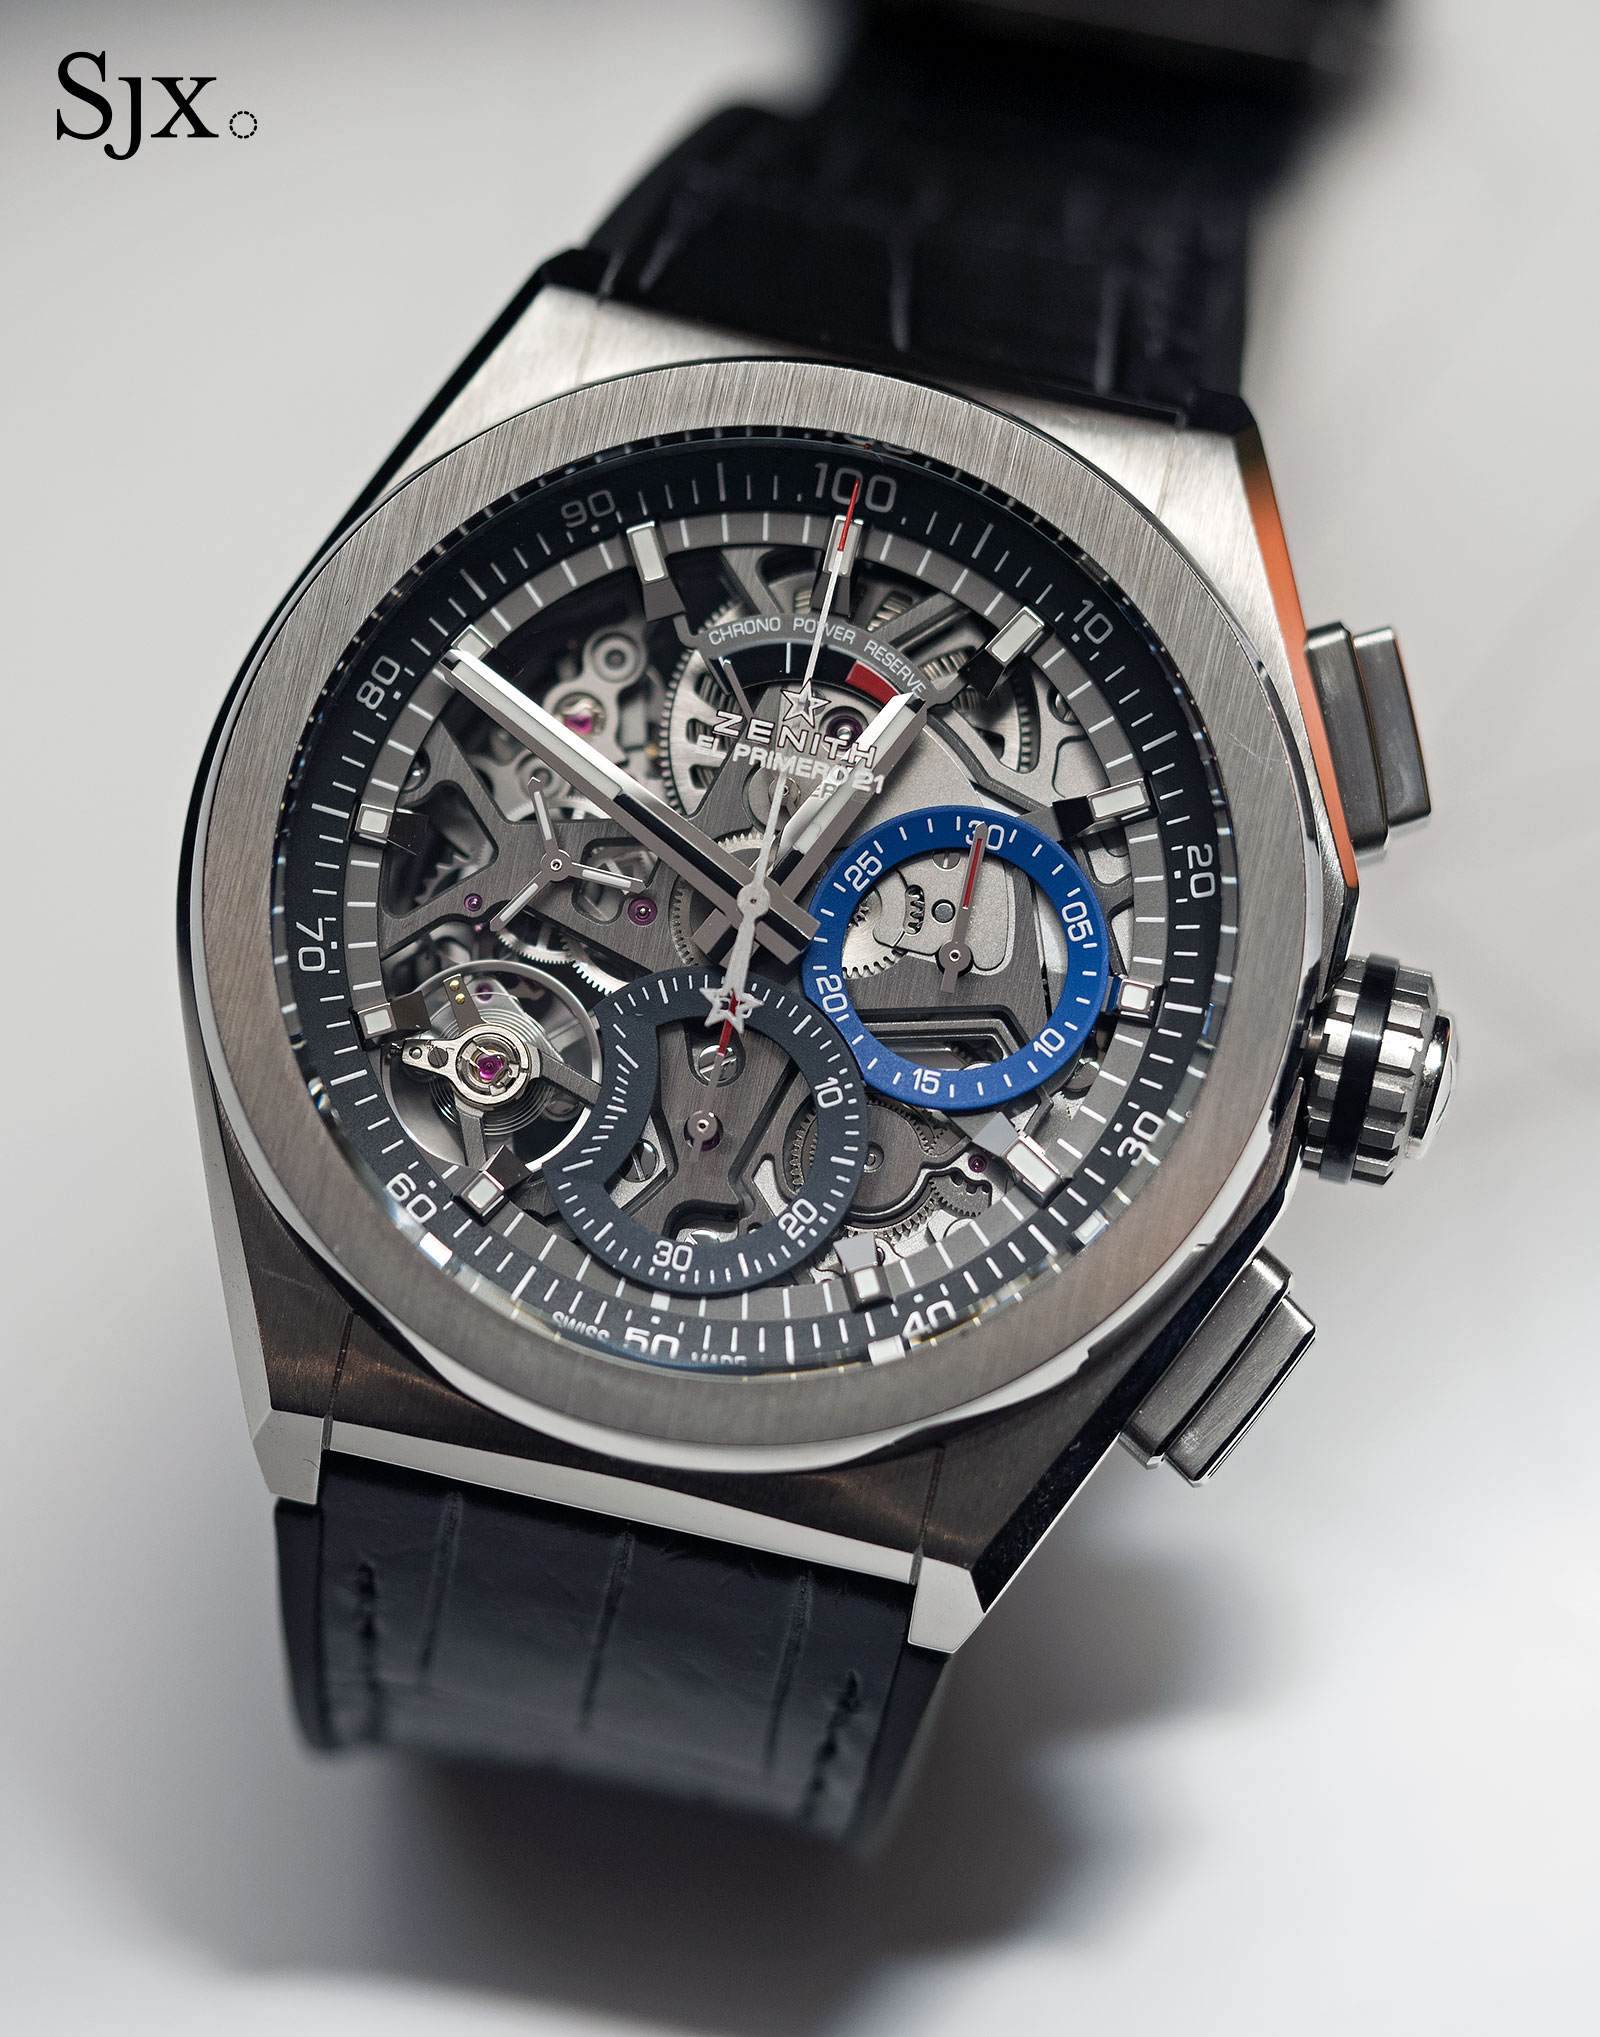 ZENITH - projet achat montre (Zenith vs Hublot)  Zenith-Defy-El-Primero-21-titanium-skeleton-1